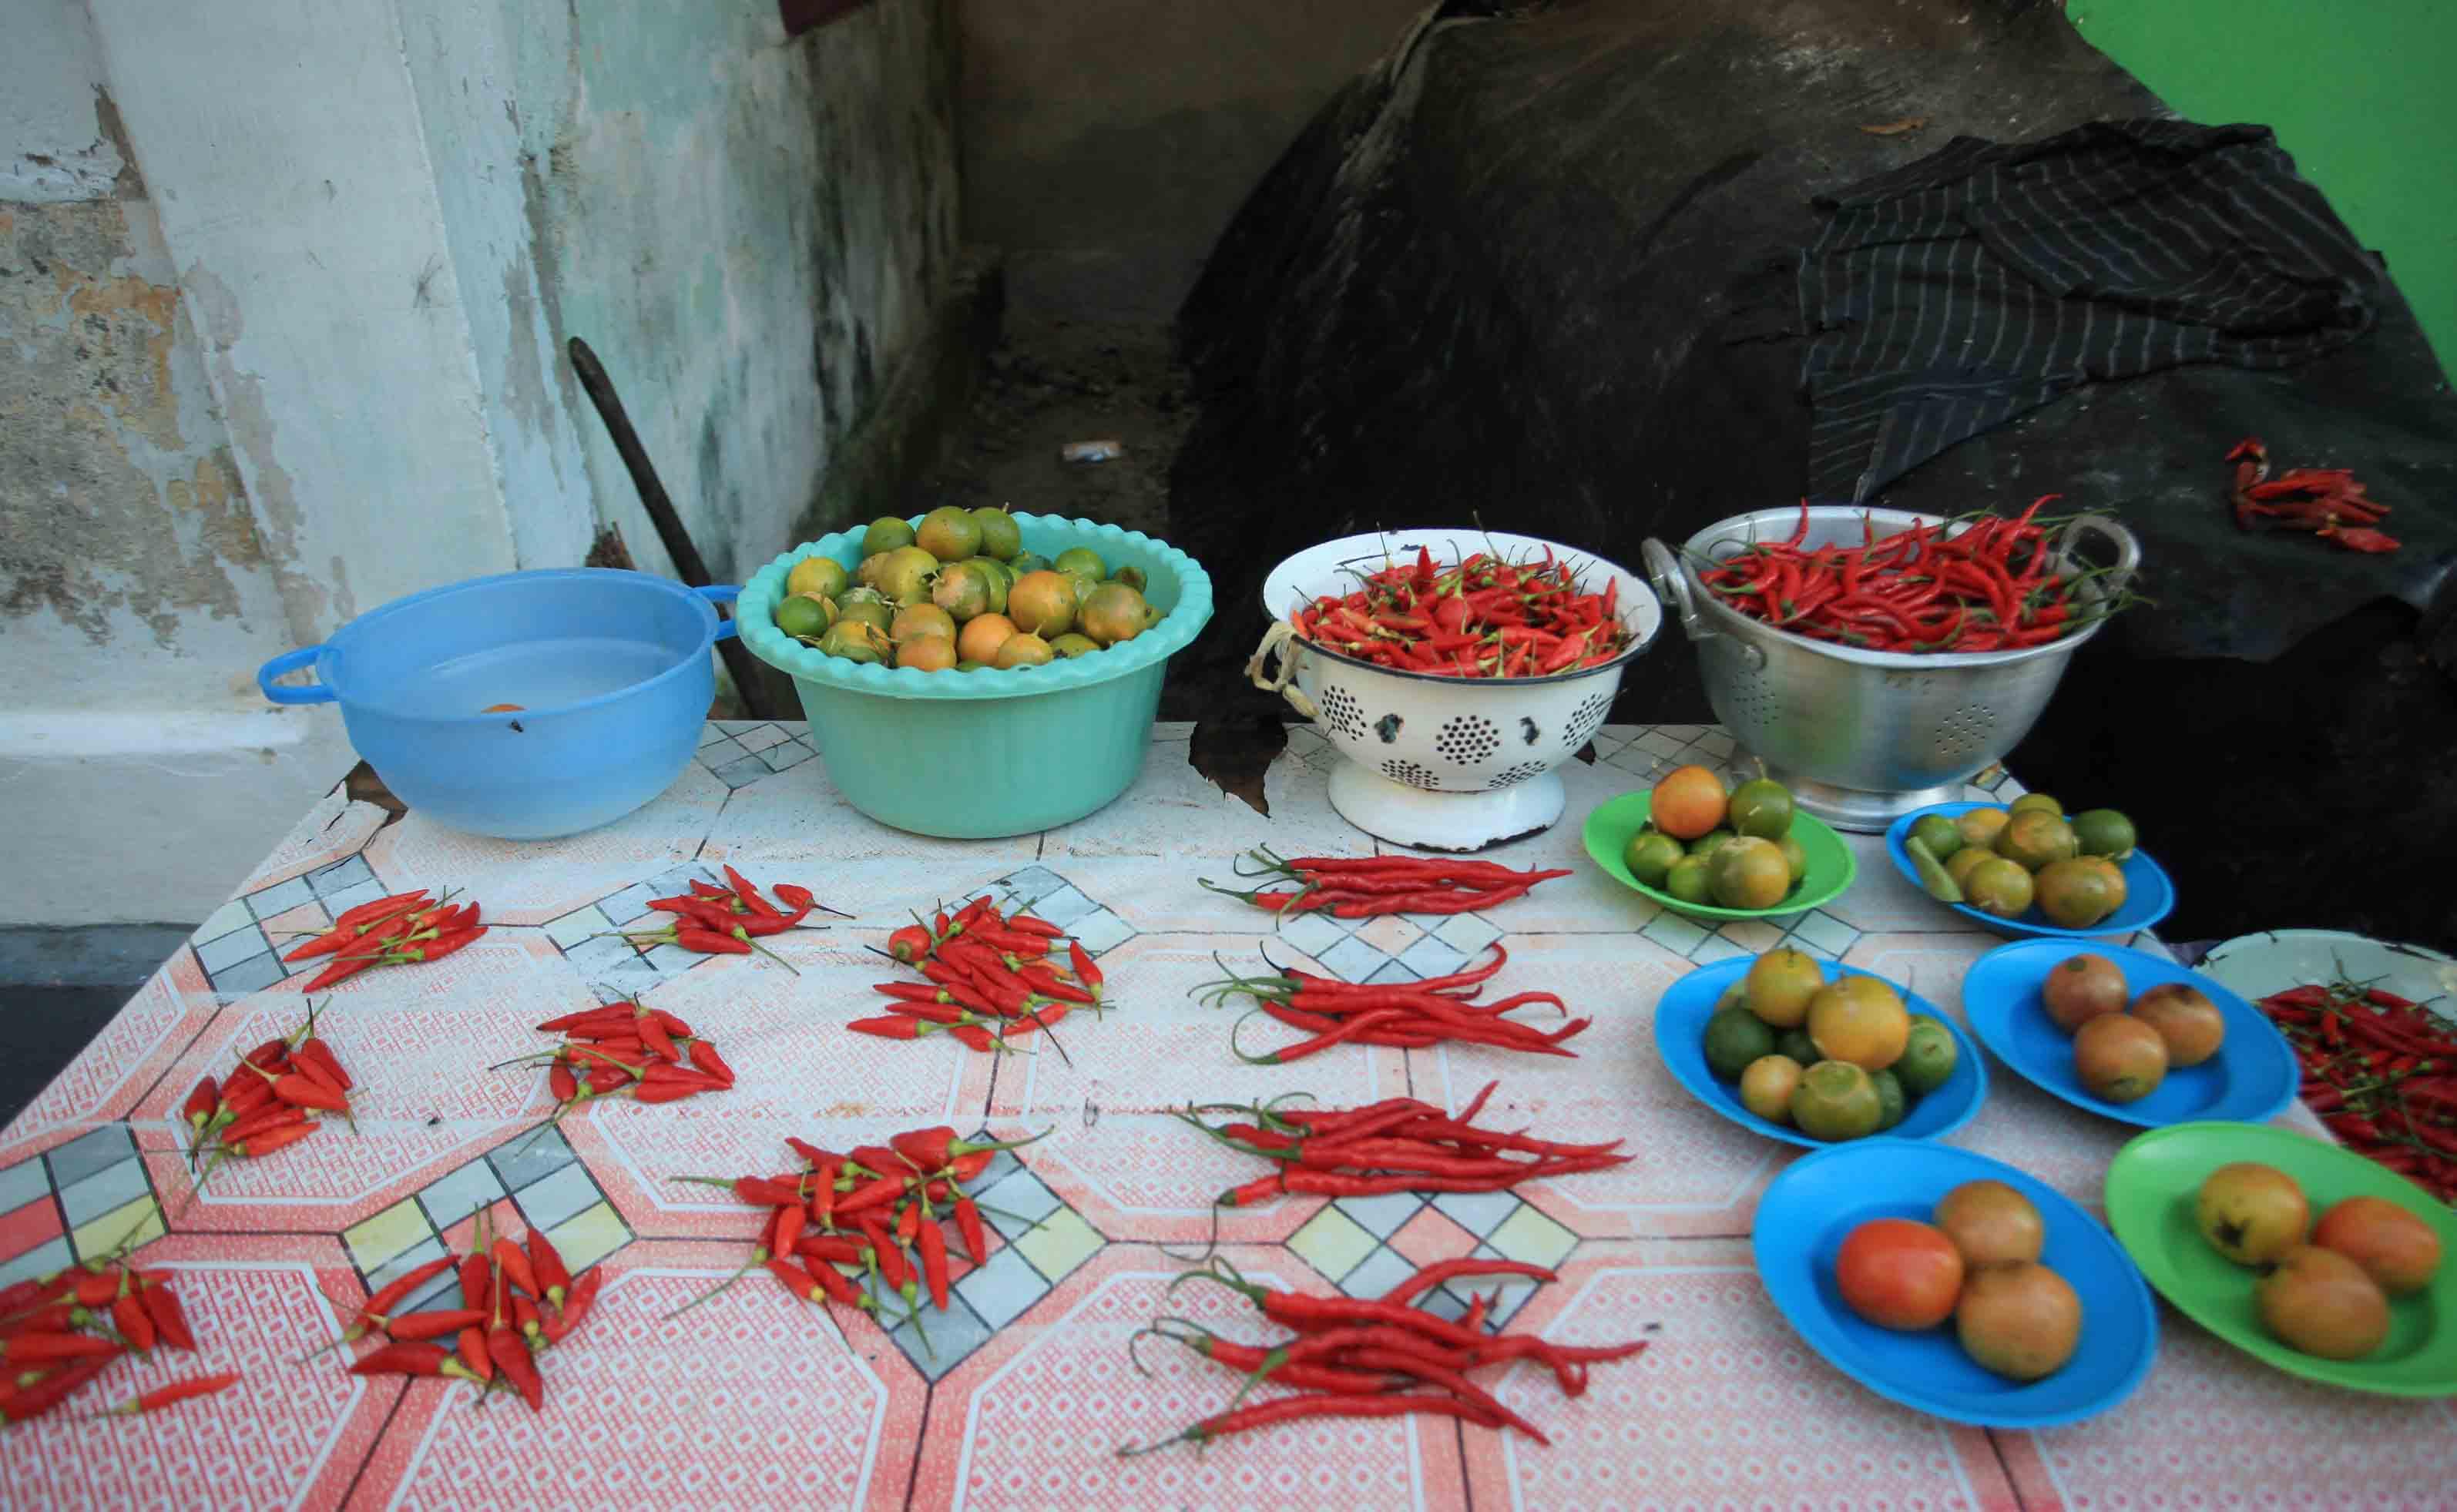 Cabai, tomat, dan jeruk yang dijajakan di depan rumah